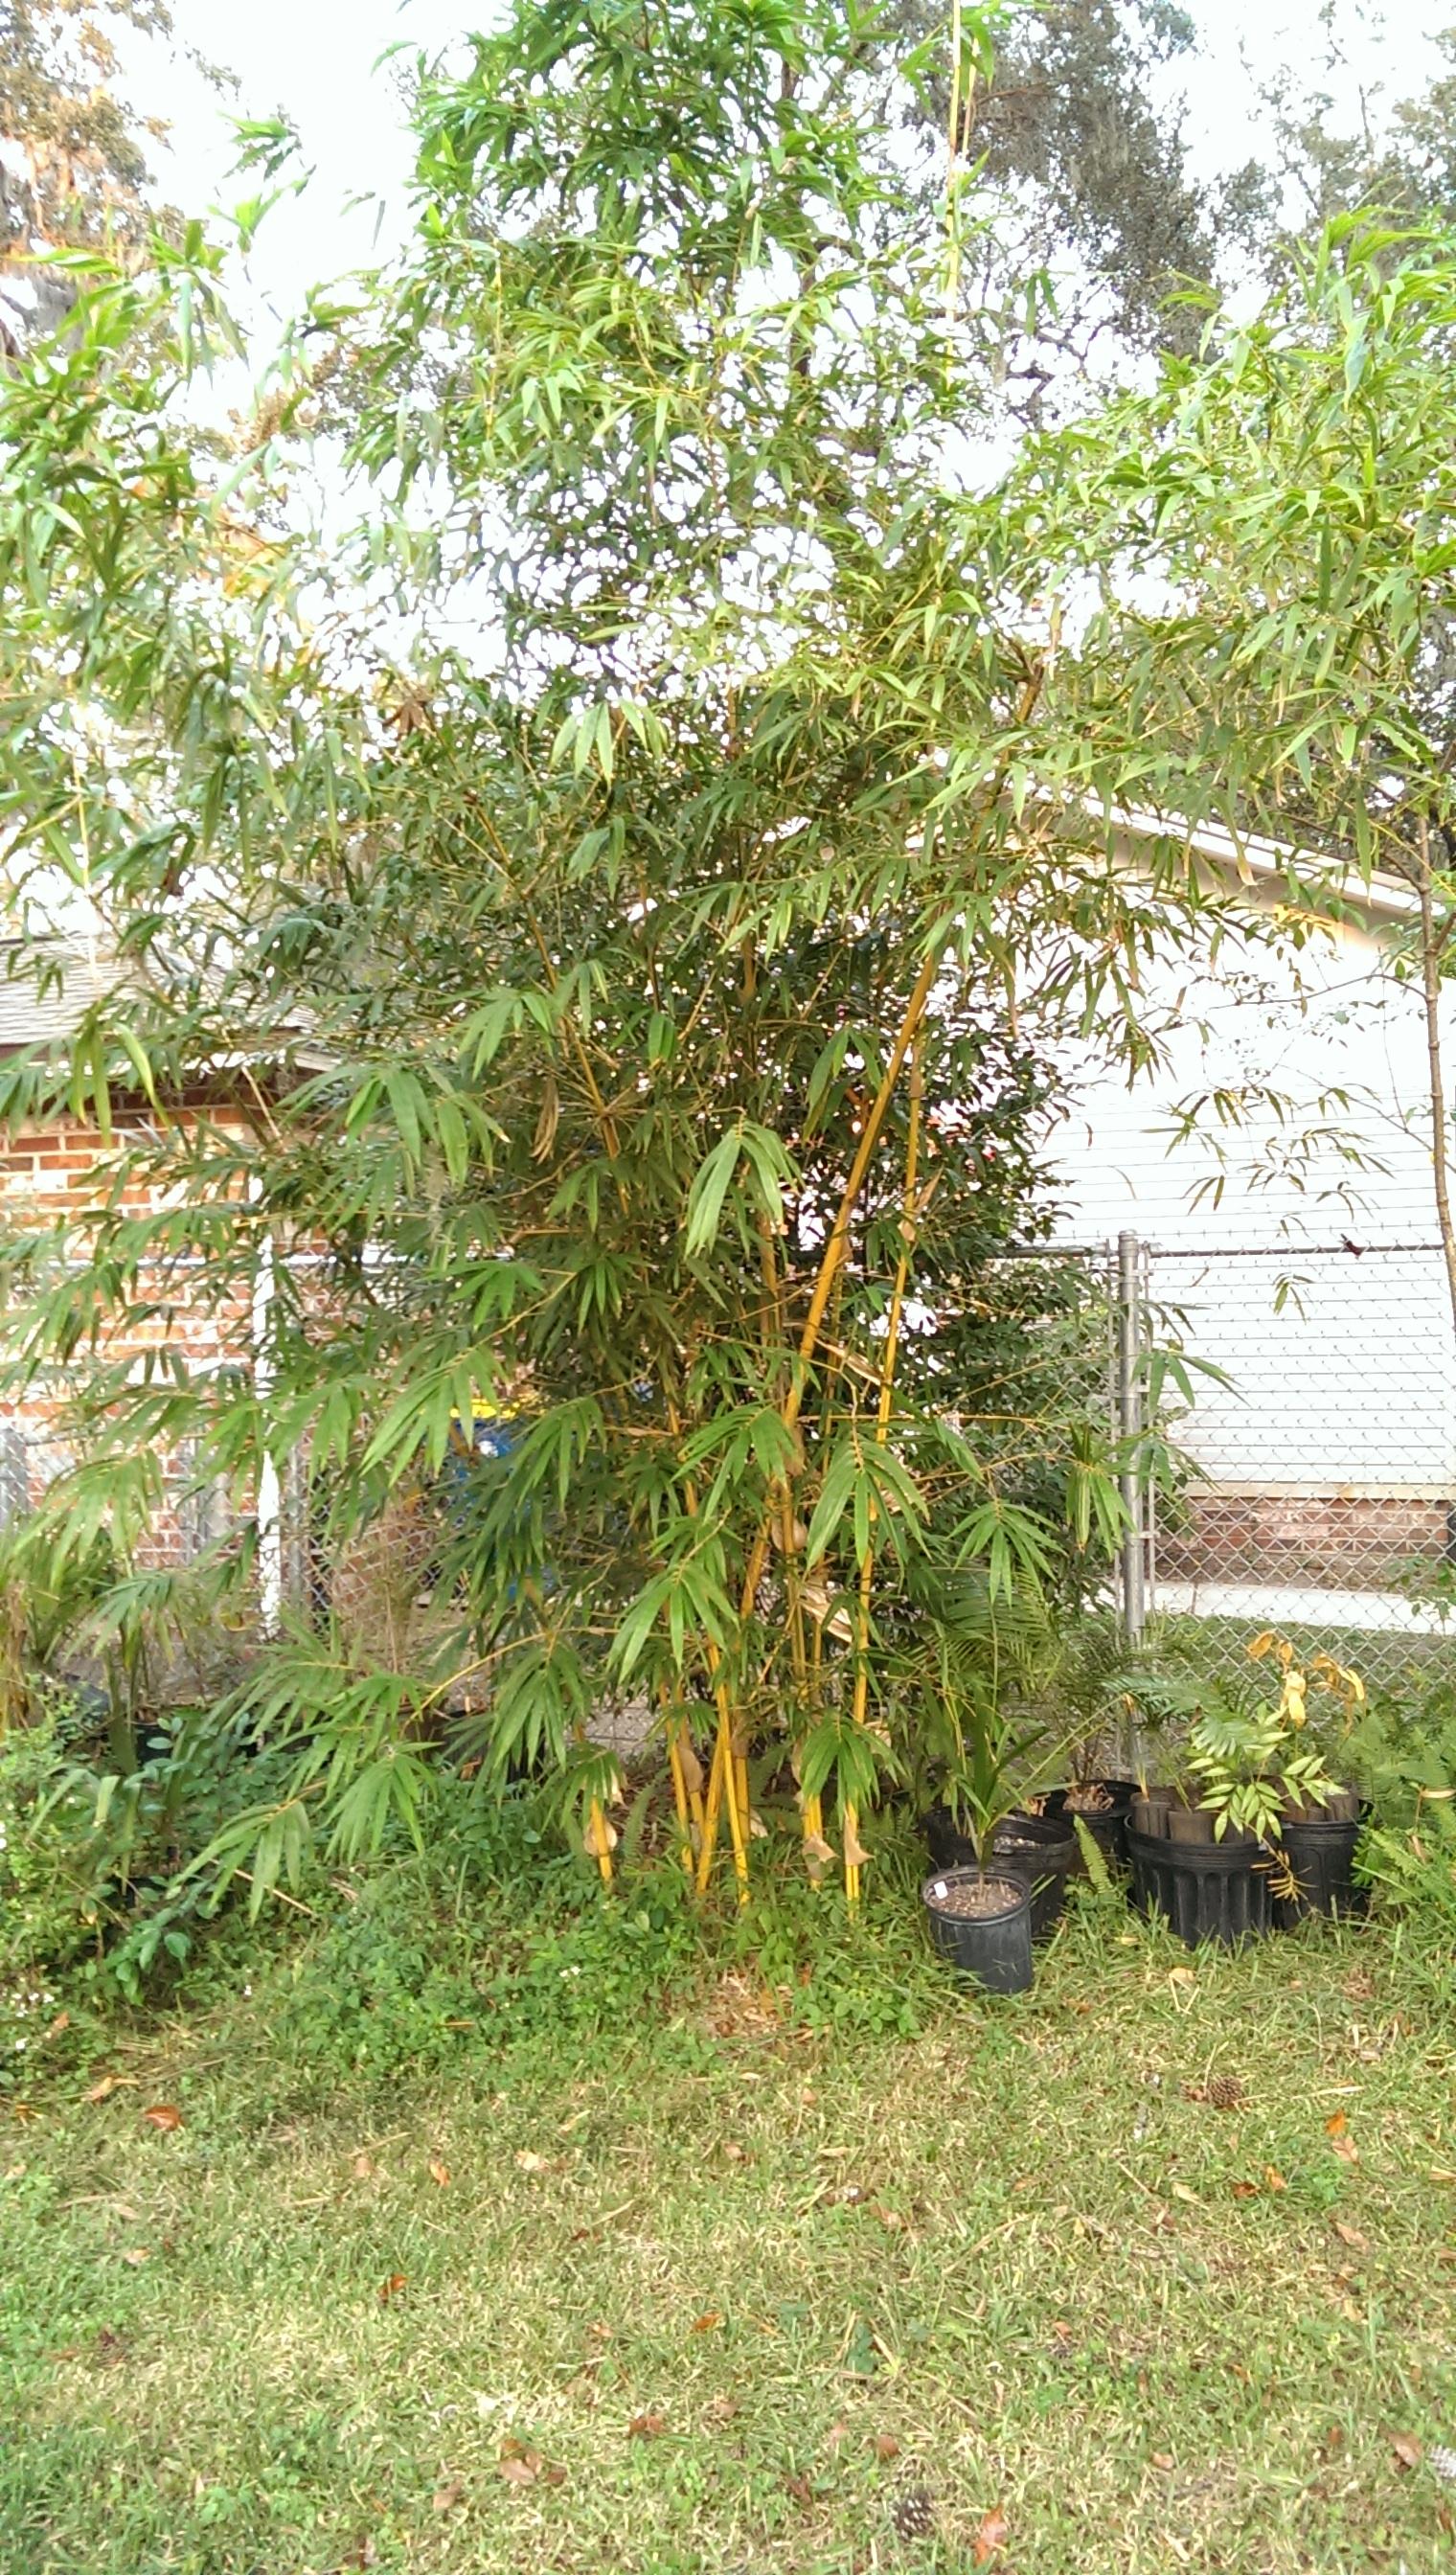 Bambusa pervariabilis 'Viridistriata'- Sunburst Bamboo growth in northeast Florida